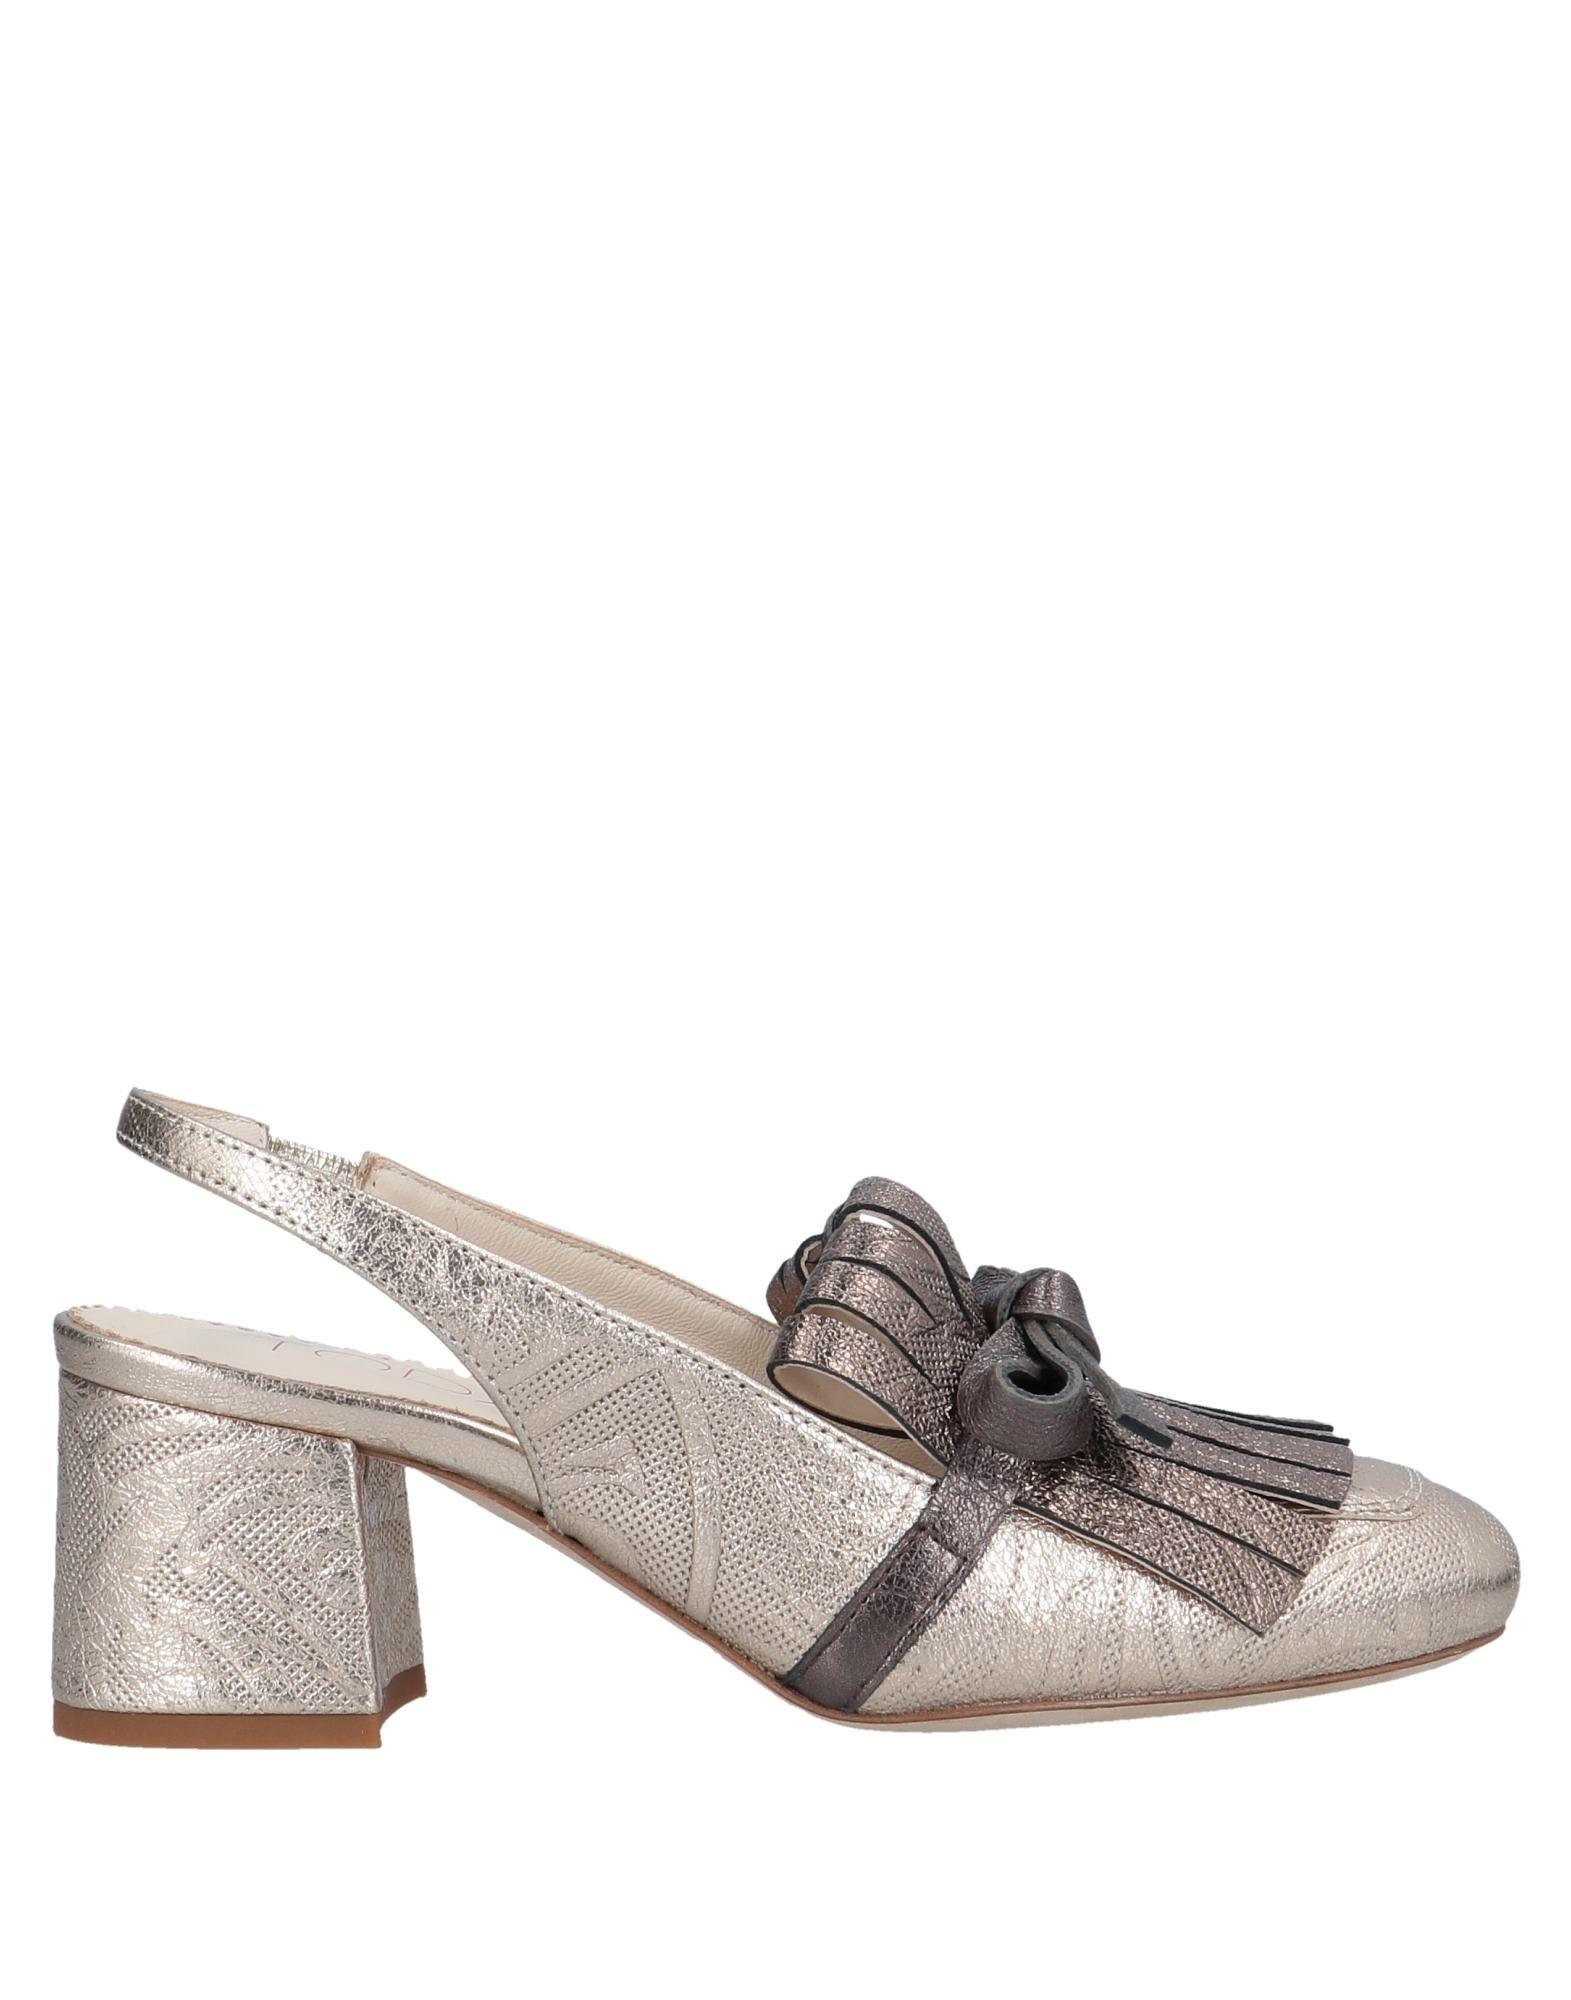 Sandali Nuove Vic Donna - 44977602DR Nuove Sandali offerte e scarpe comode 2c439c